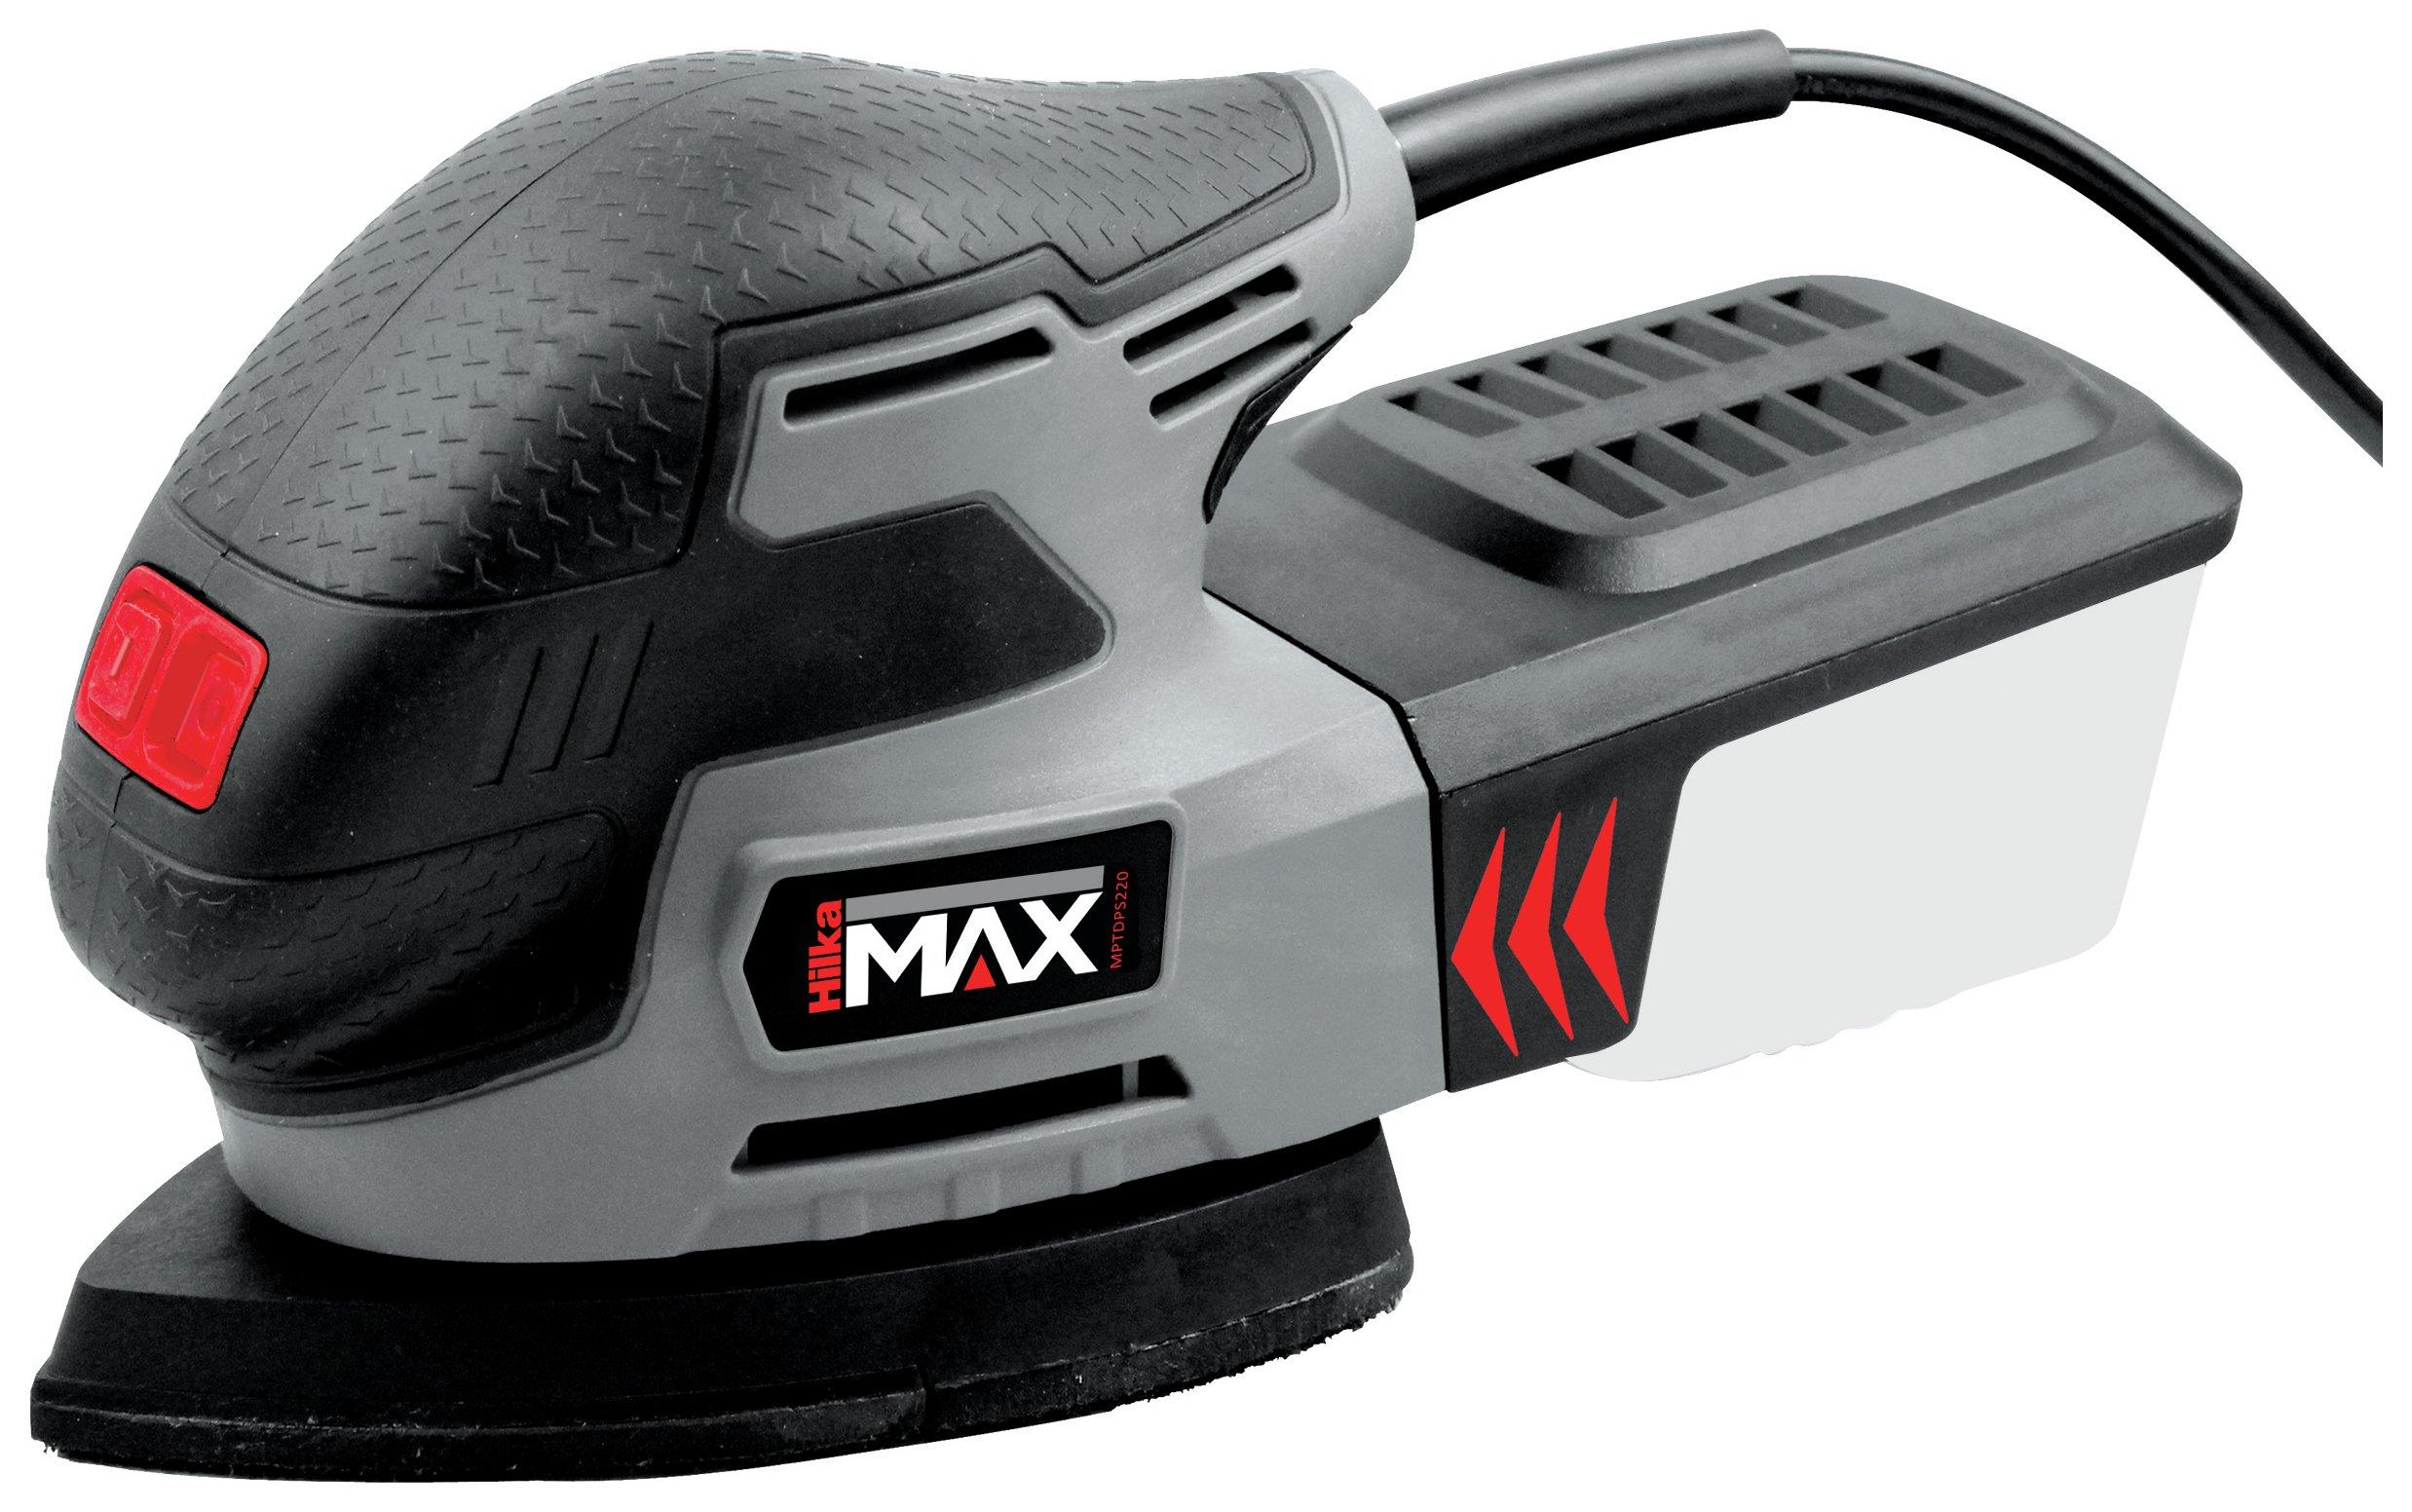 Hilka Max 220w Detail Palm Sander. lowest price